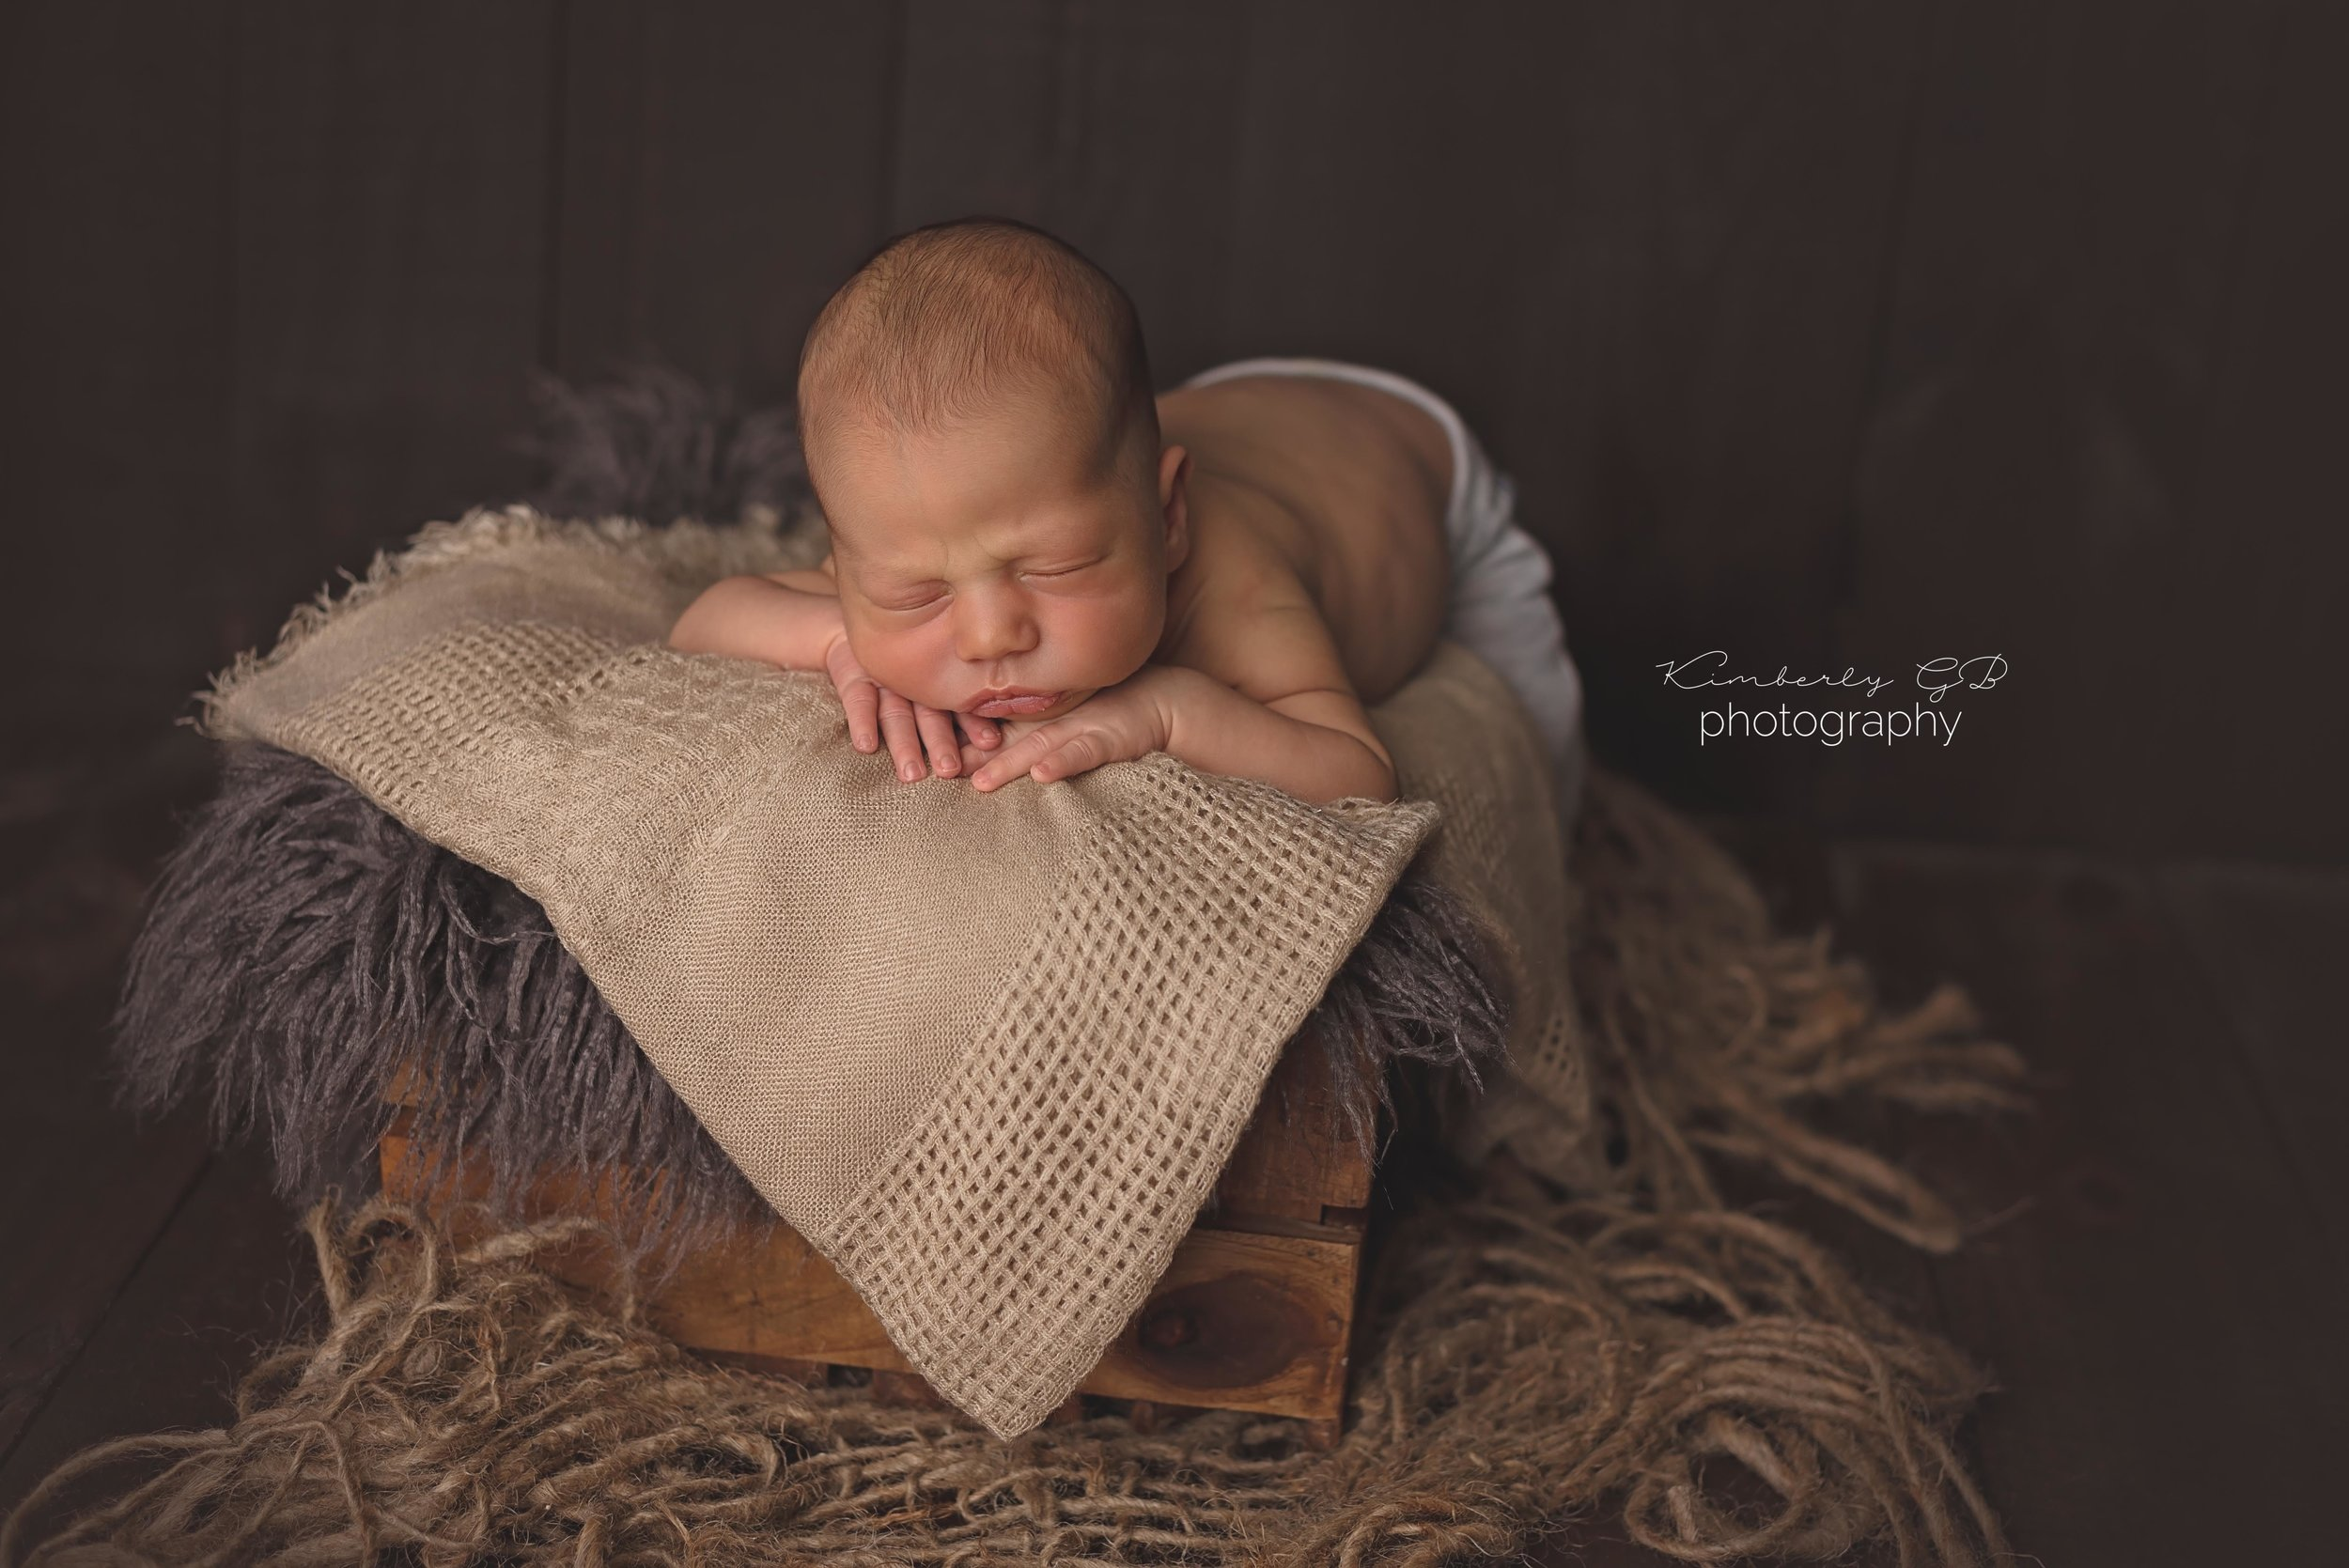 fotografia-de-recien-nacidos-bebes-newborn-en-puerto-rico-kimberly-gb-photography-fotografa-101.jpg